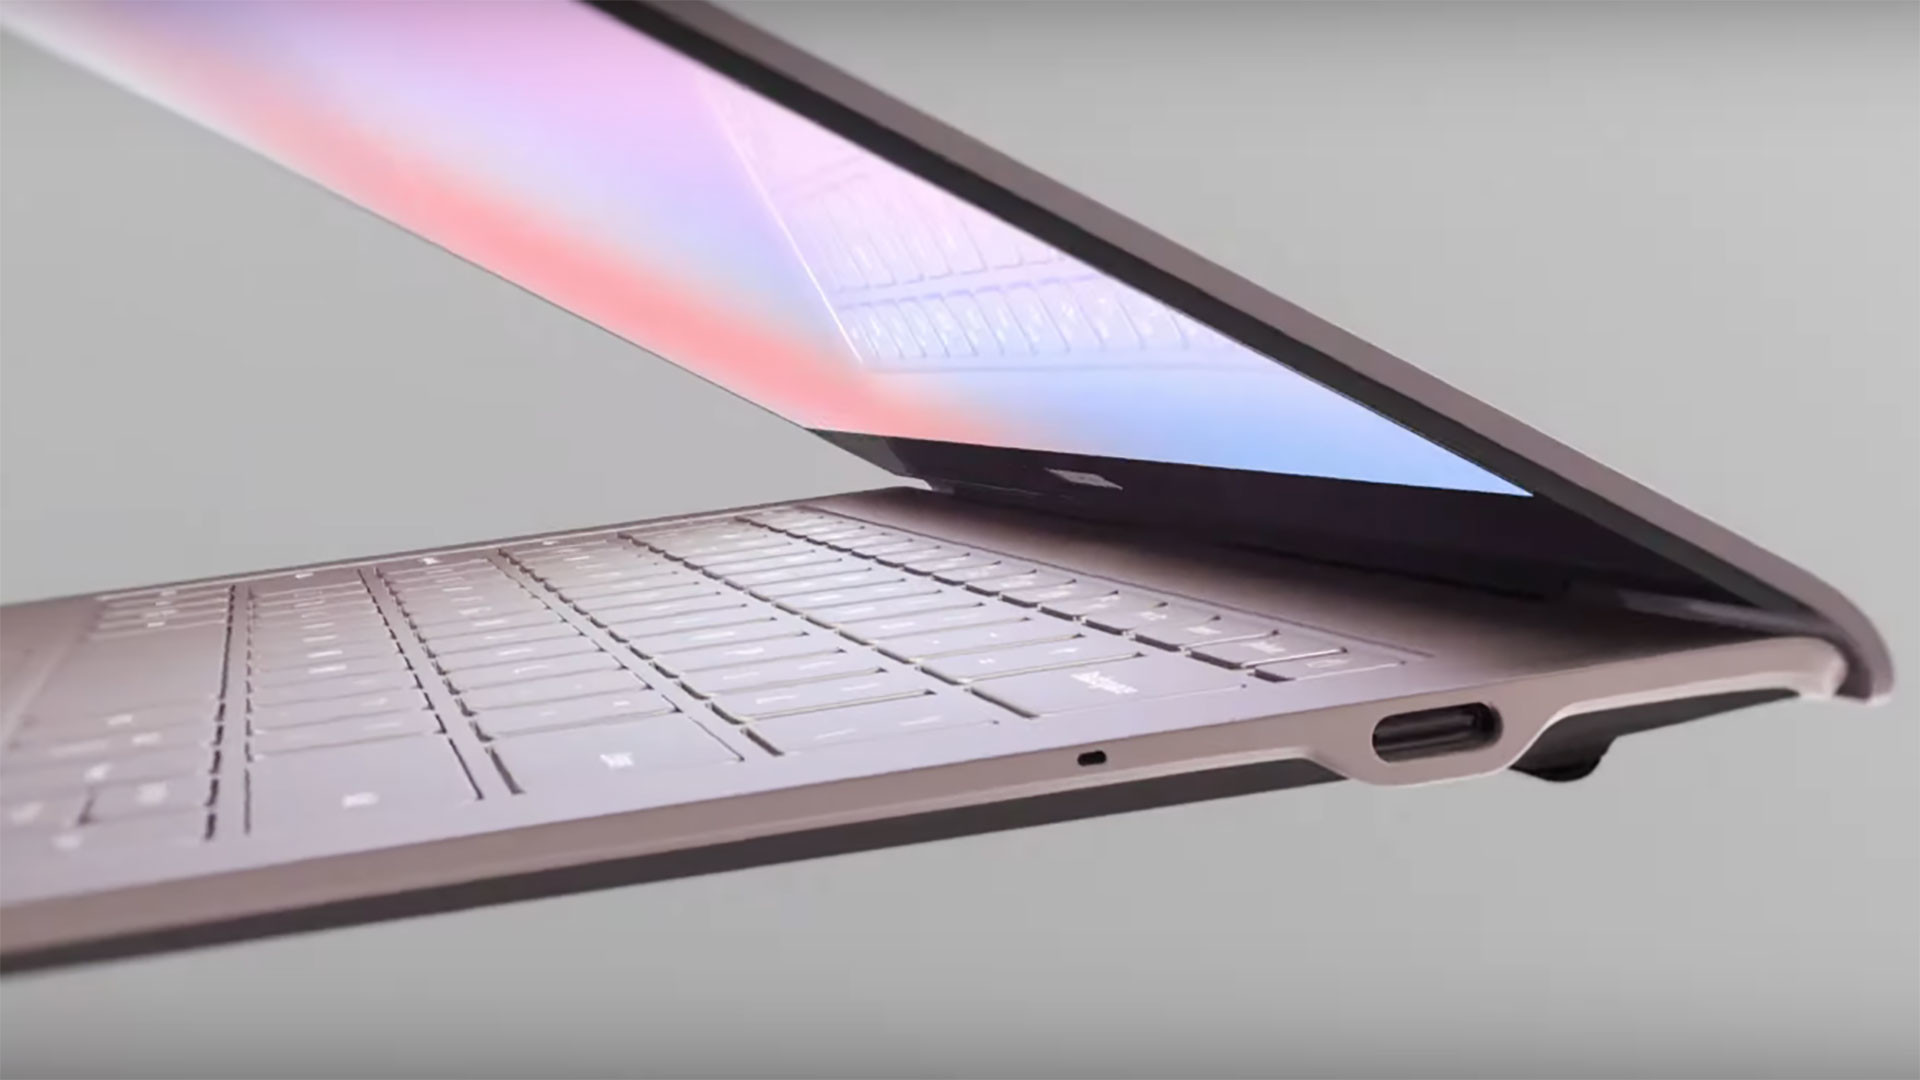 "<p>Кадр <a href=""https://www.youtube.com/watch?v=JiGkOVG73kc"" target=""_self"">видео </a>© <a href=""https://www.youtube.com/watch?v=JiGkOVG73kc"" target=""_self""><strong>Samsung</strong></a></p>"